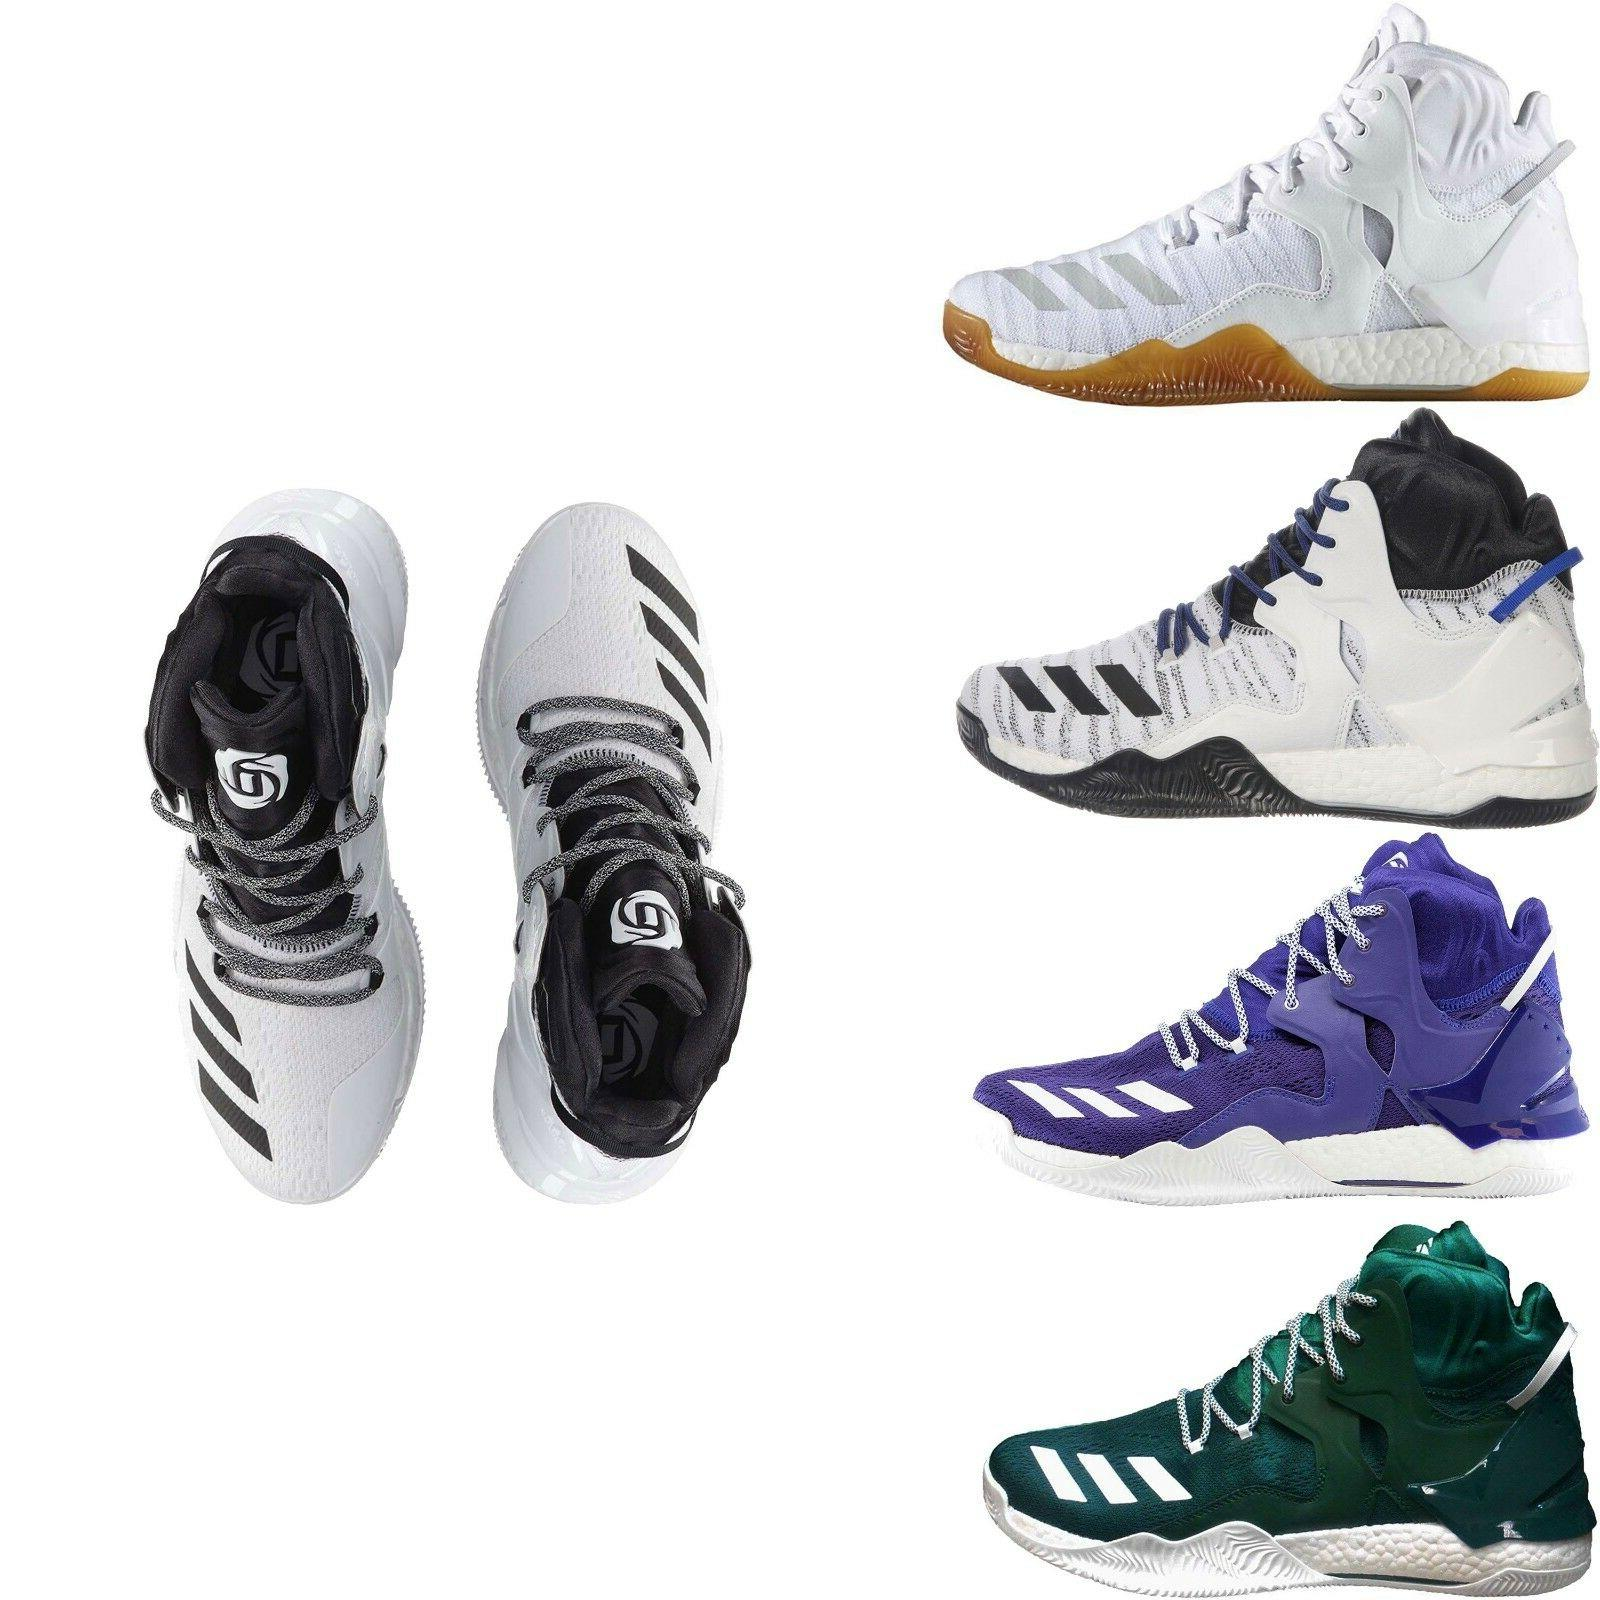 Adidas Men's Athletic Sneakers Derrick Rose 7 Basketball Sho